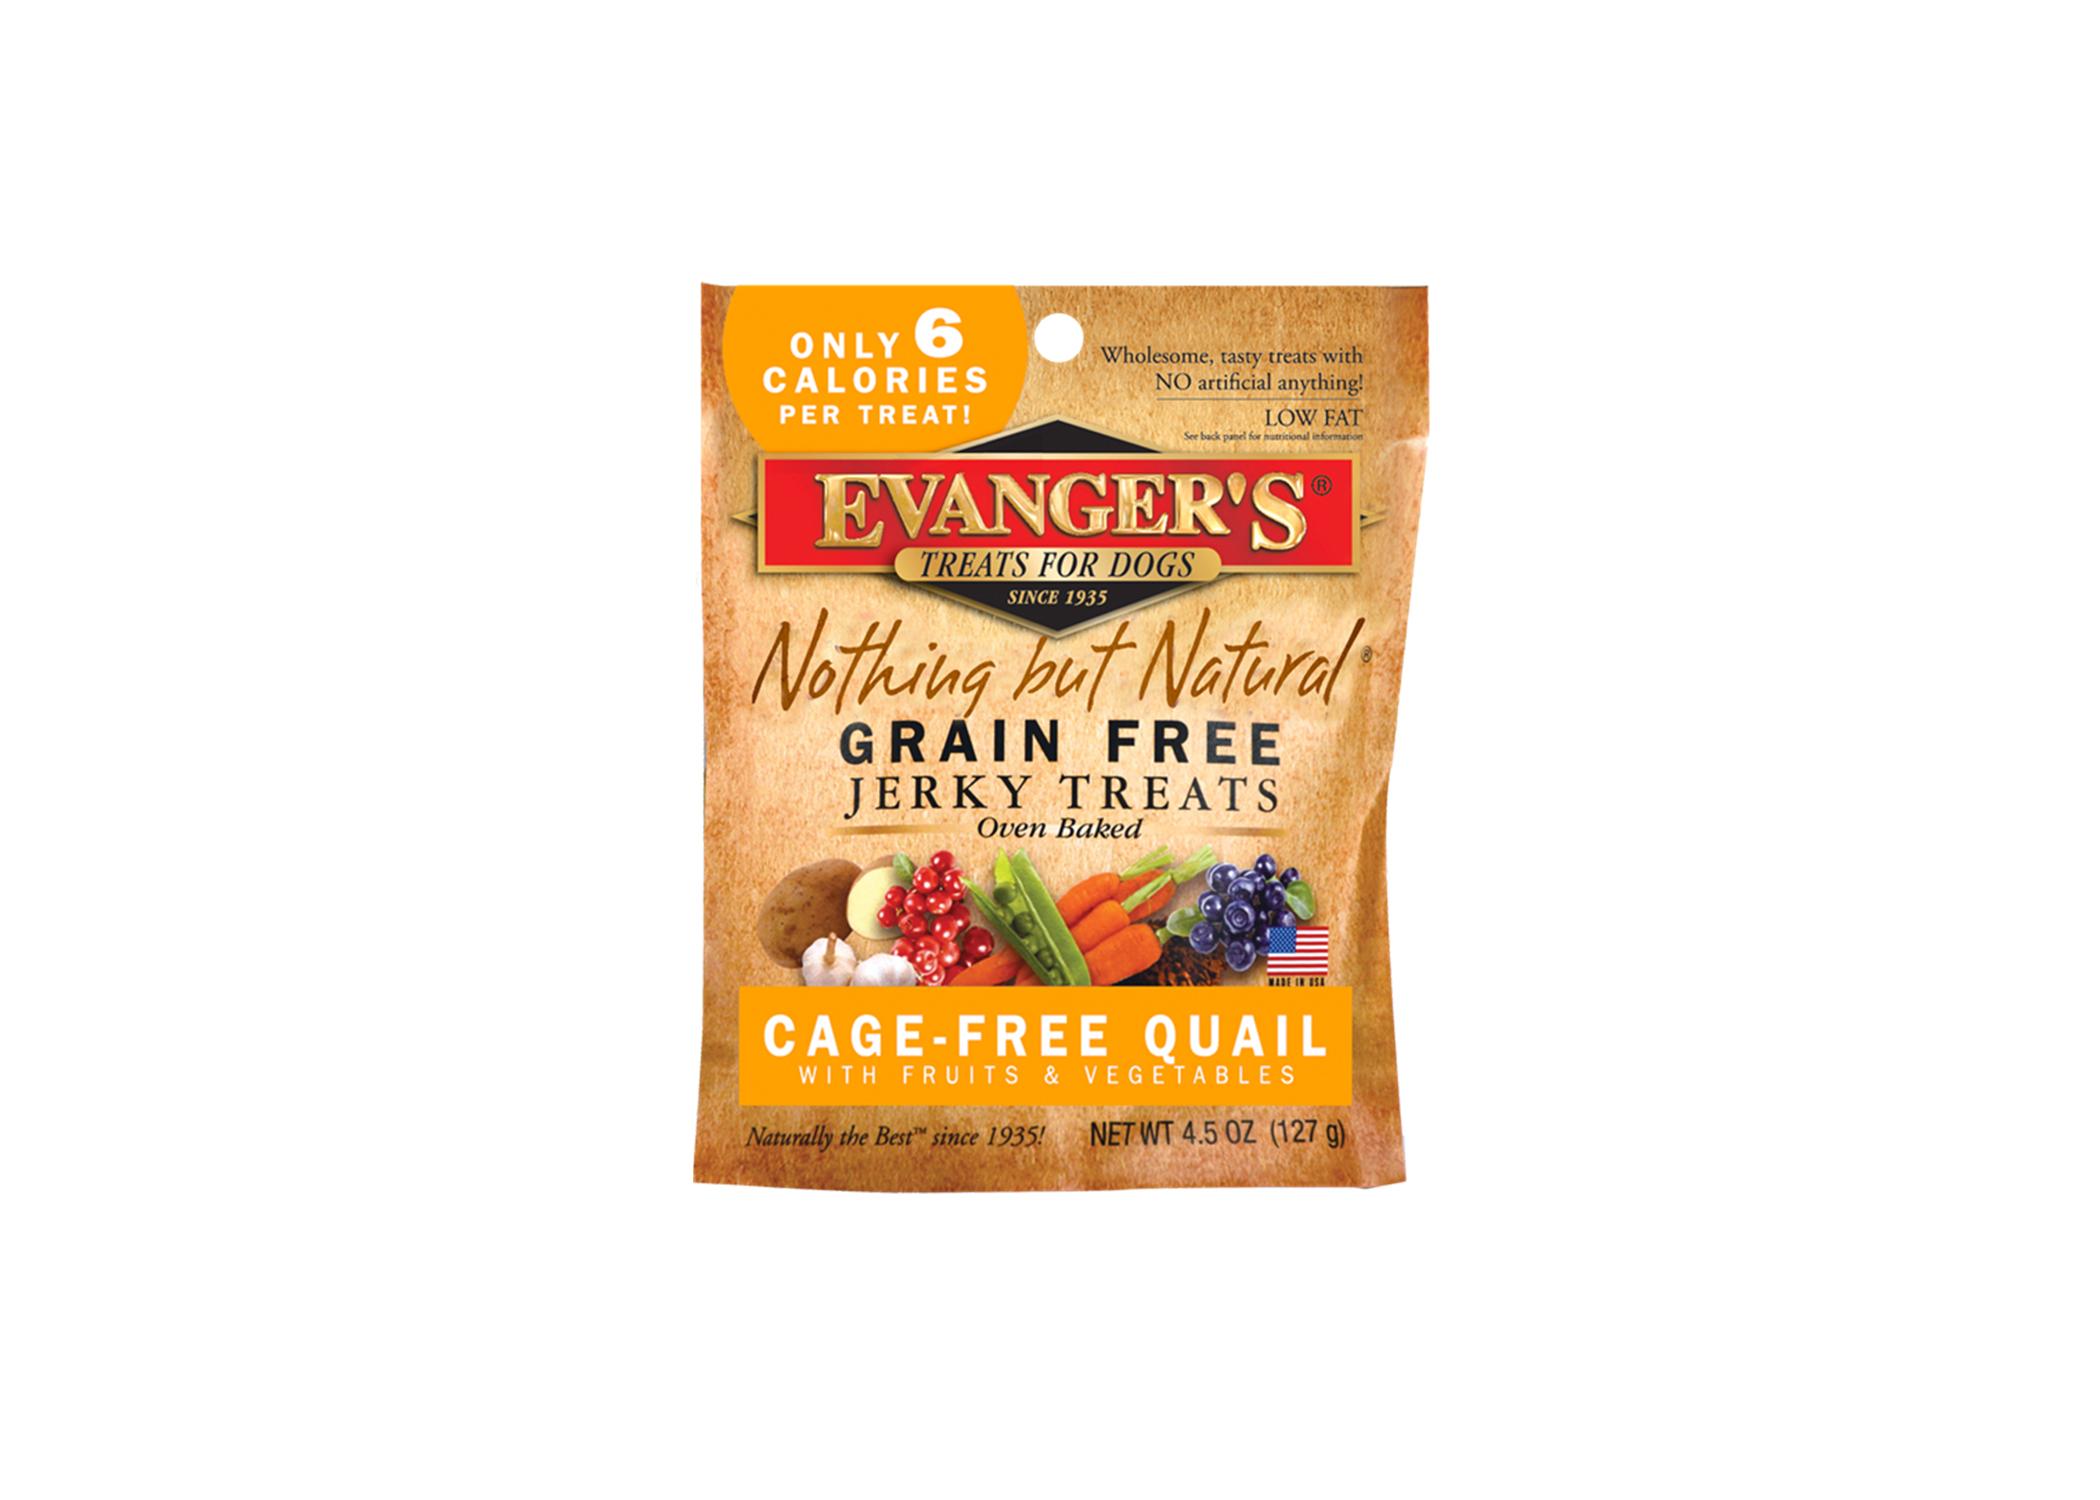 Especial Vegetables Jerky Treats Dog Cat Food Evangers Dog Food Reviews Evanger S Dry Dog Food Recall Fruits Quail bark post Evangers Dog Food Recall